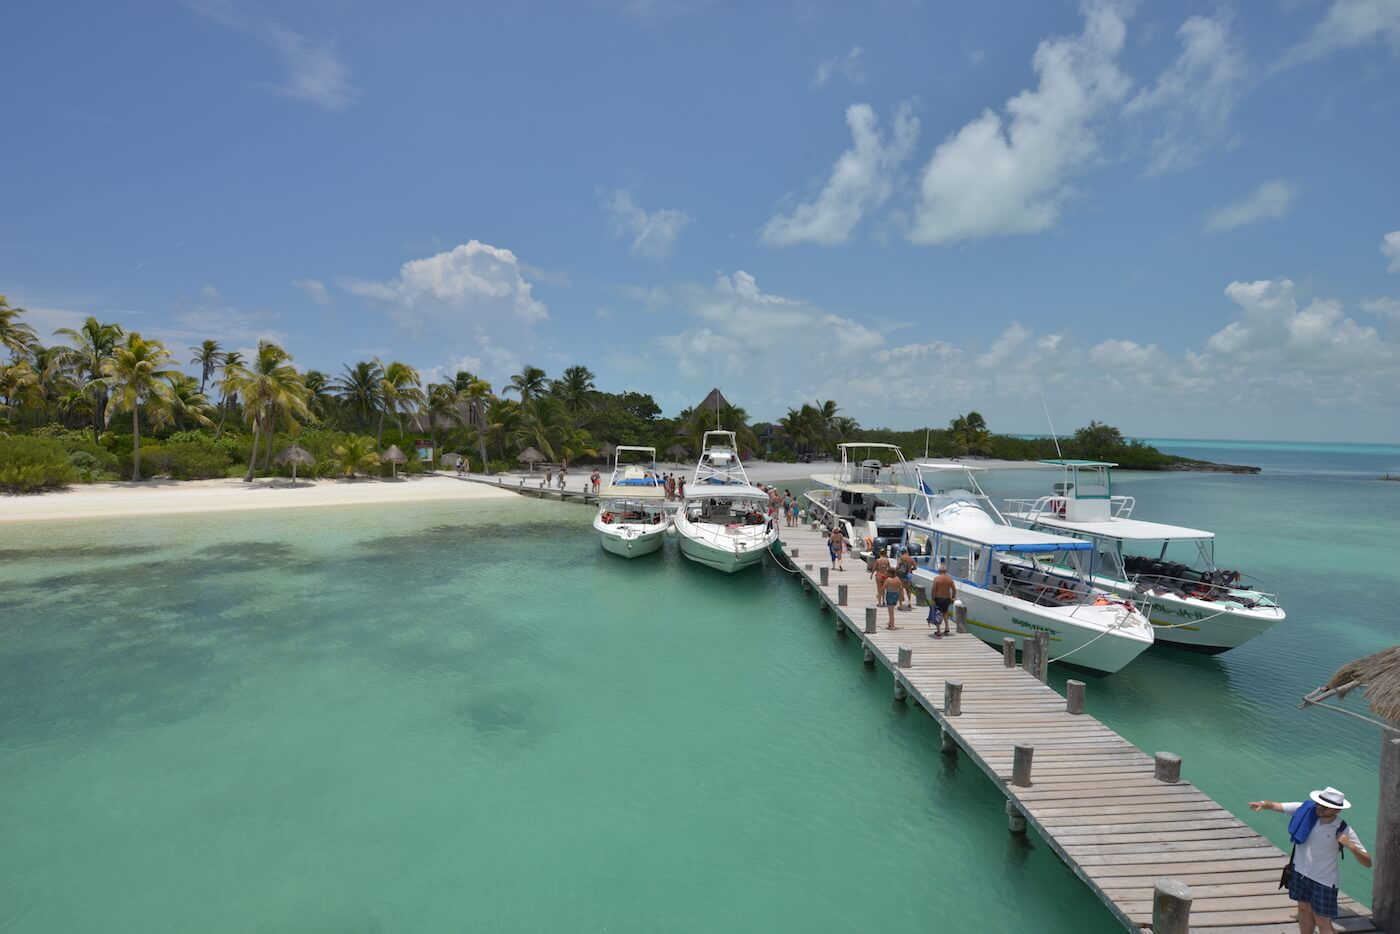 Isla-Contoy-Tours-Snorkel-Beach-All-Inclusive-Cancun-9